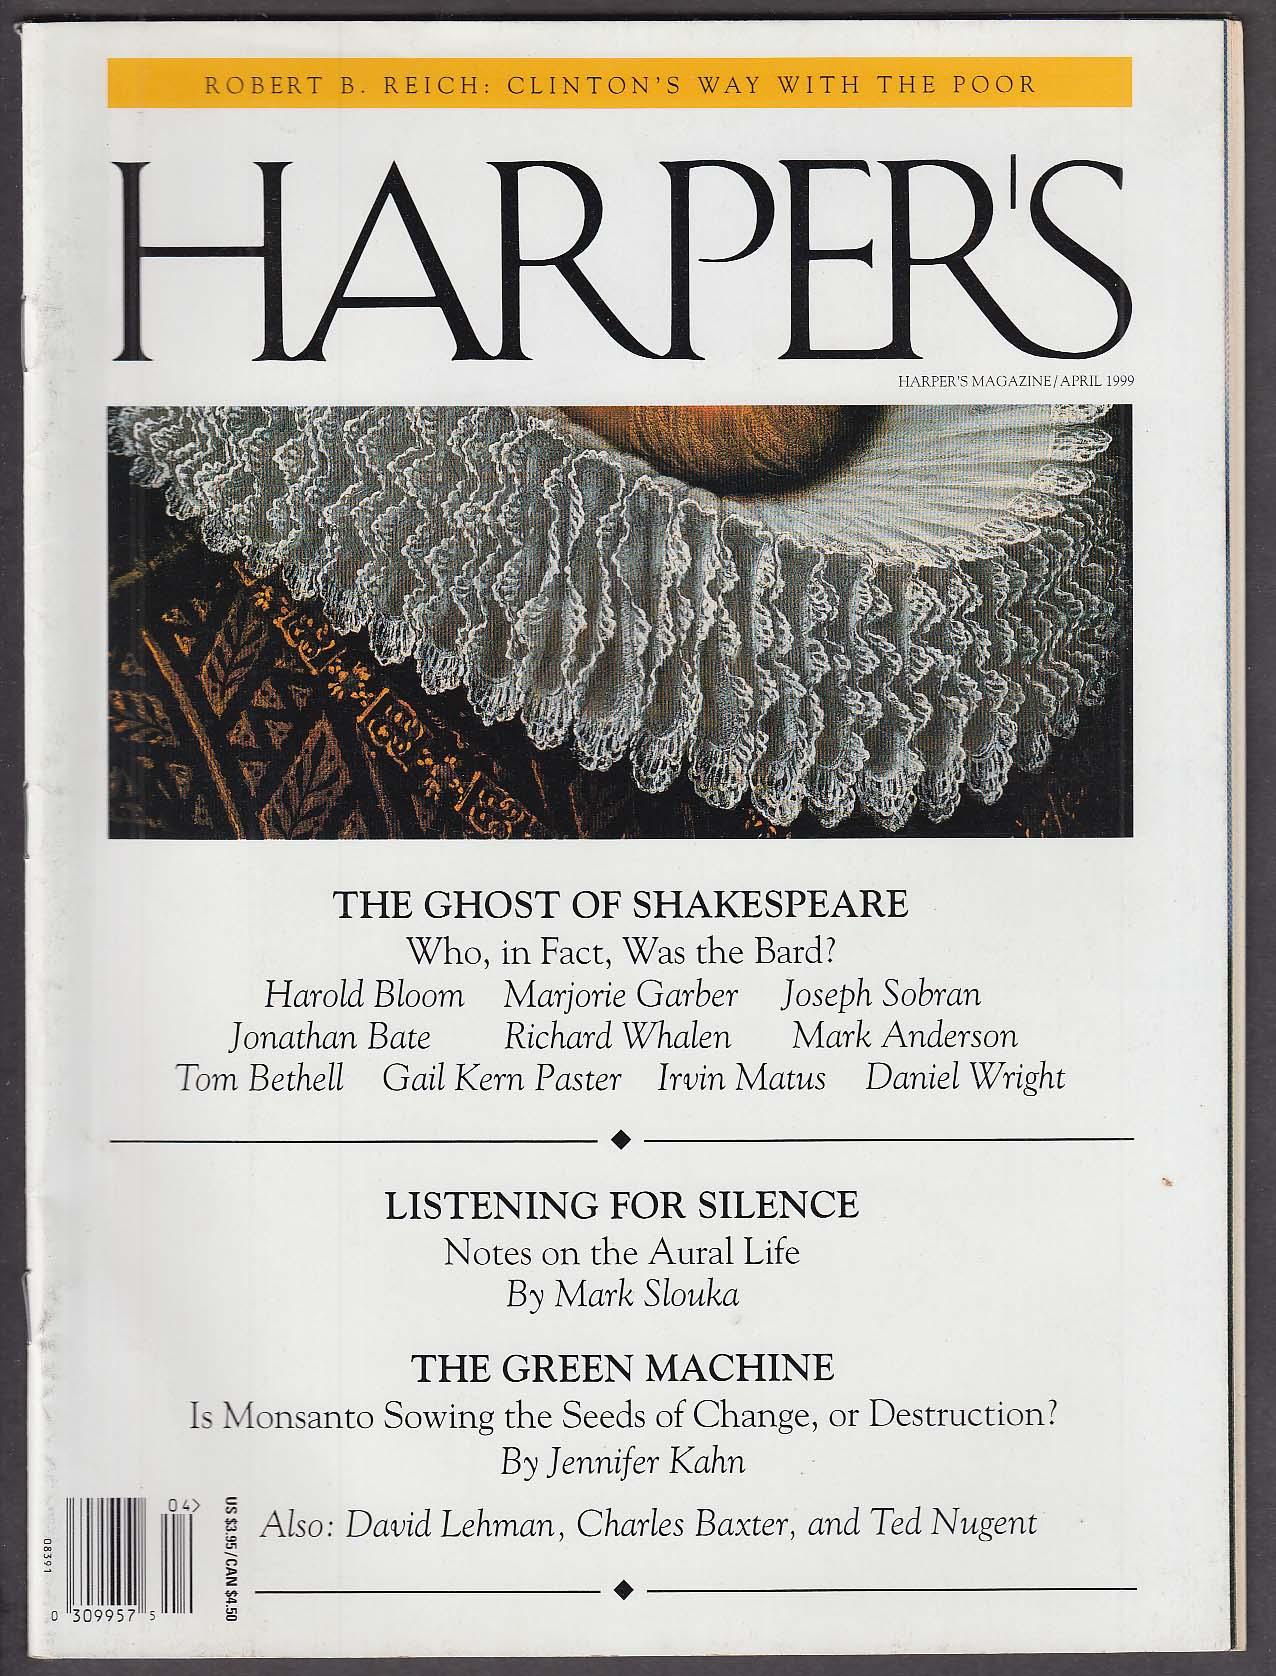 HARPER'S Robert B Reich Clinton William Shakespeare Monsanto Ted Nugent + 4 1999